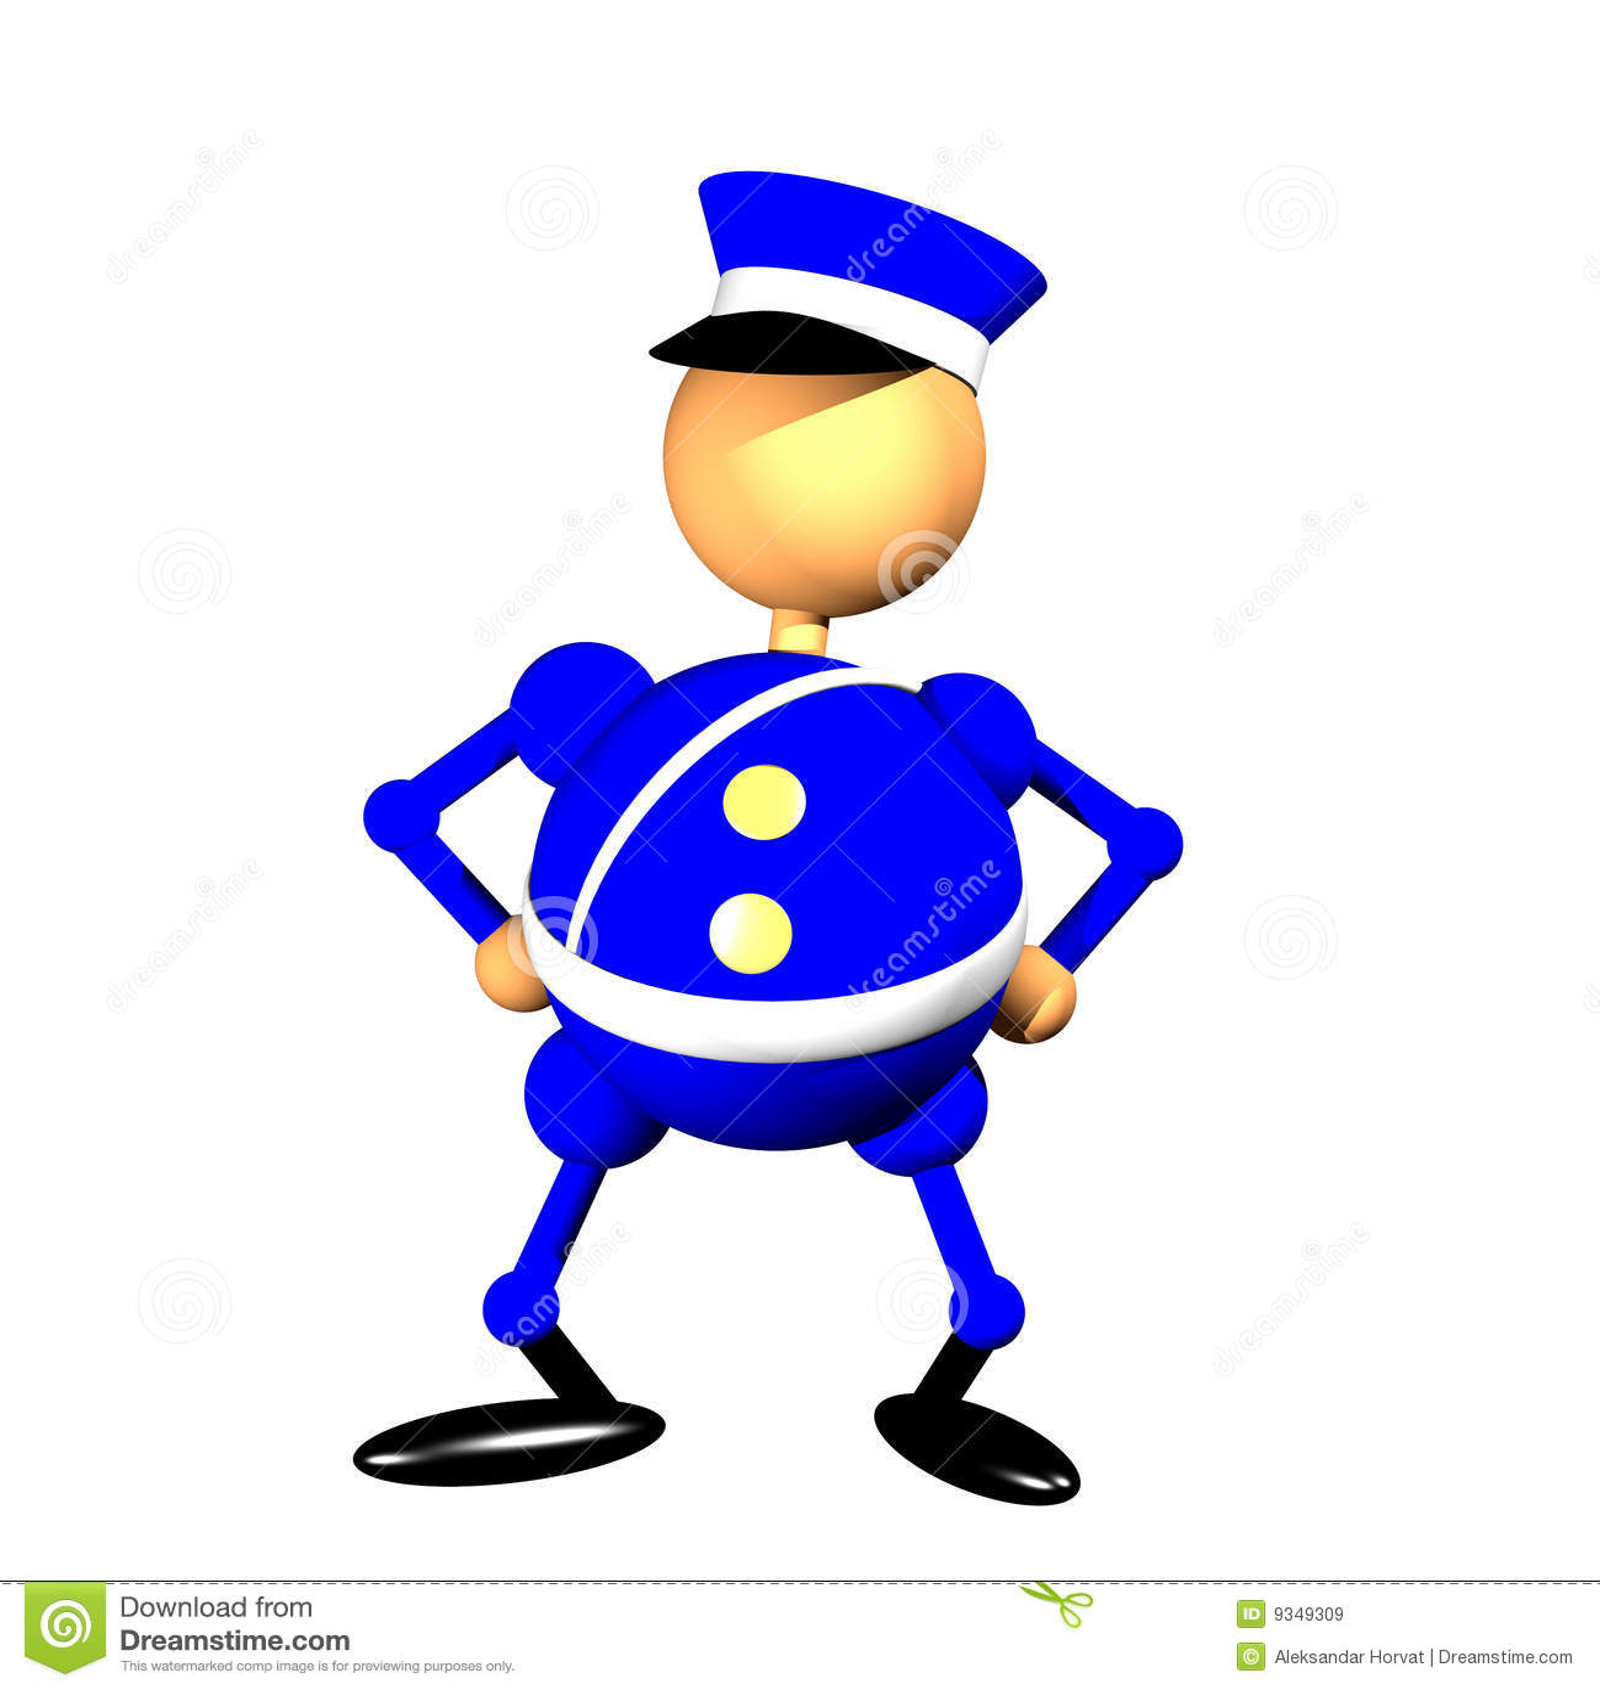 policeman clipart stock illustration illustration of occupation rh dreamstime com clip art police car clip art police car